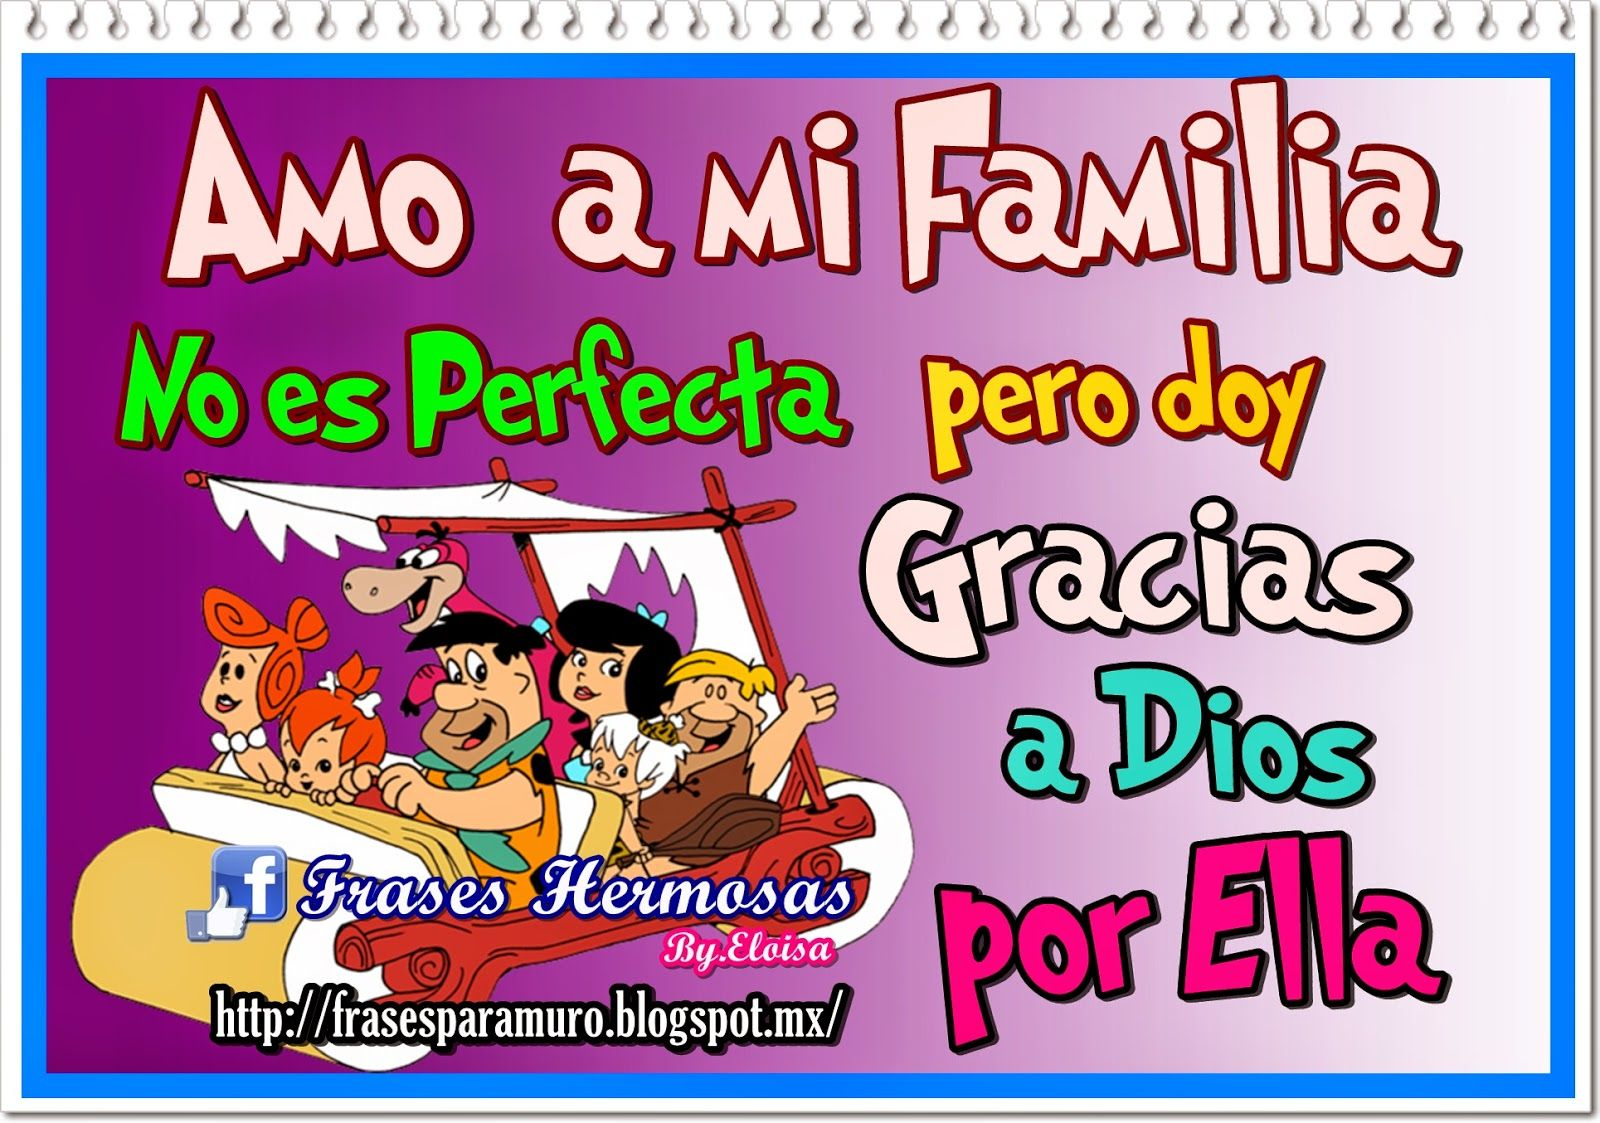 Frases De Familia: Frases Para Tu Muro: Amo A Mi Familia